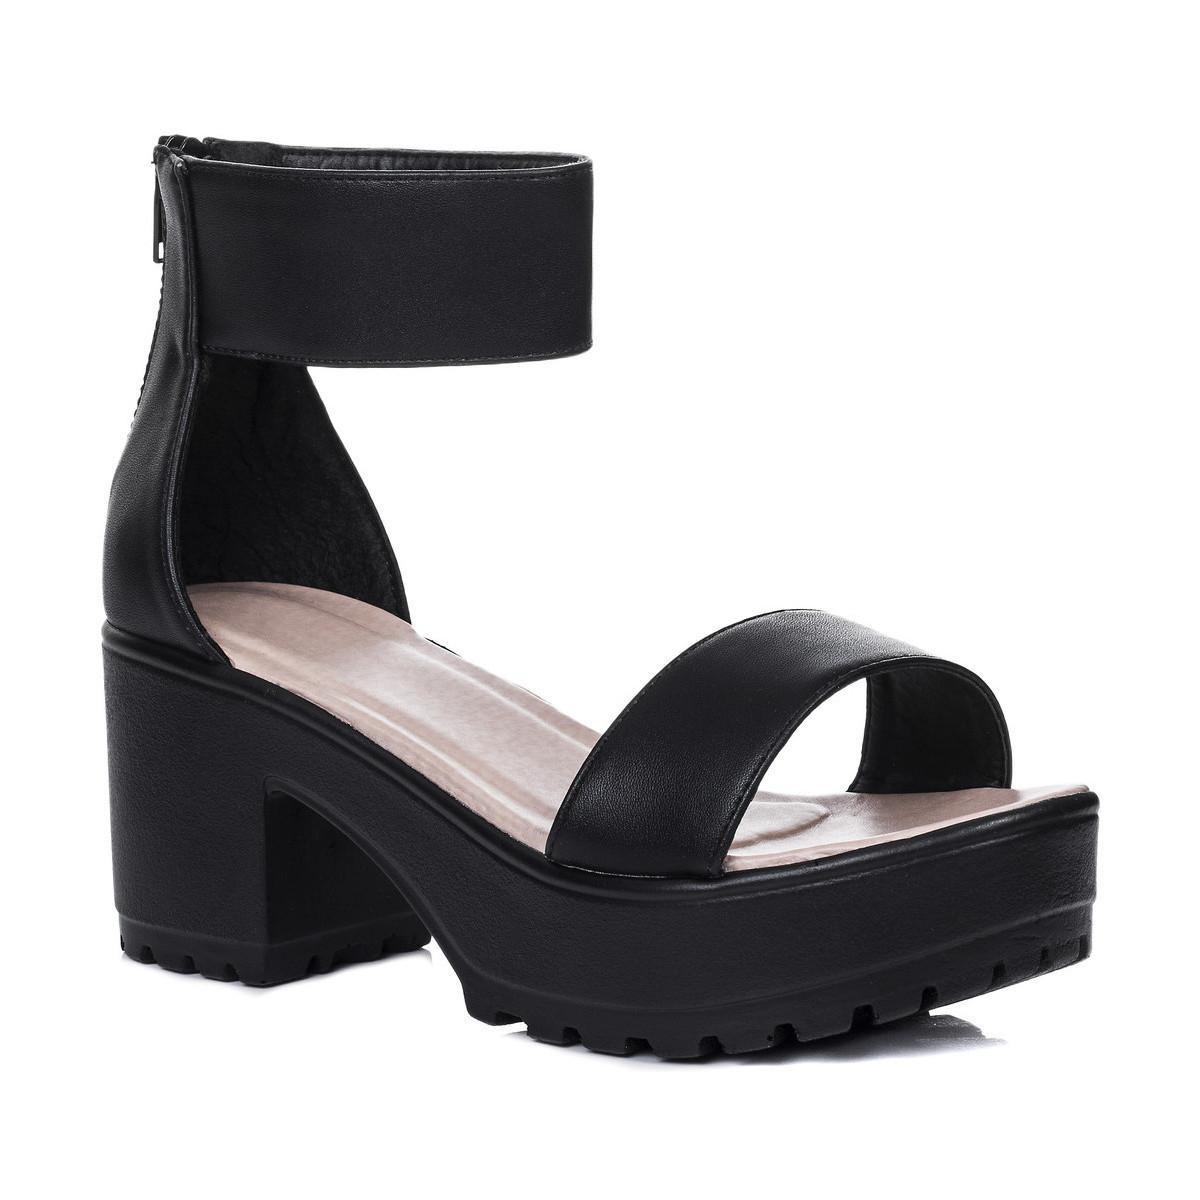 f2325009354 ... SPYLOVEBUY Sweetest Platform Cleated Sole Block Heel Sandals Shoes